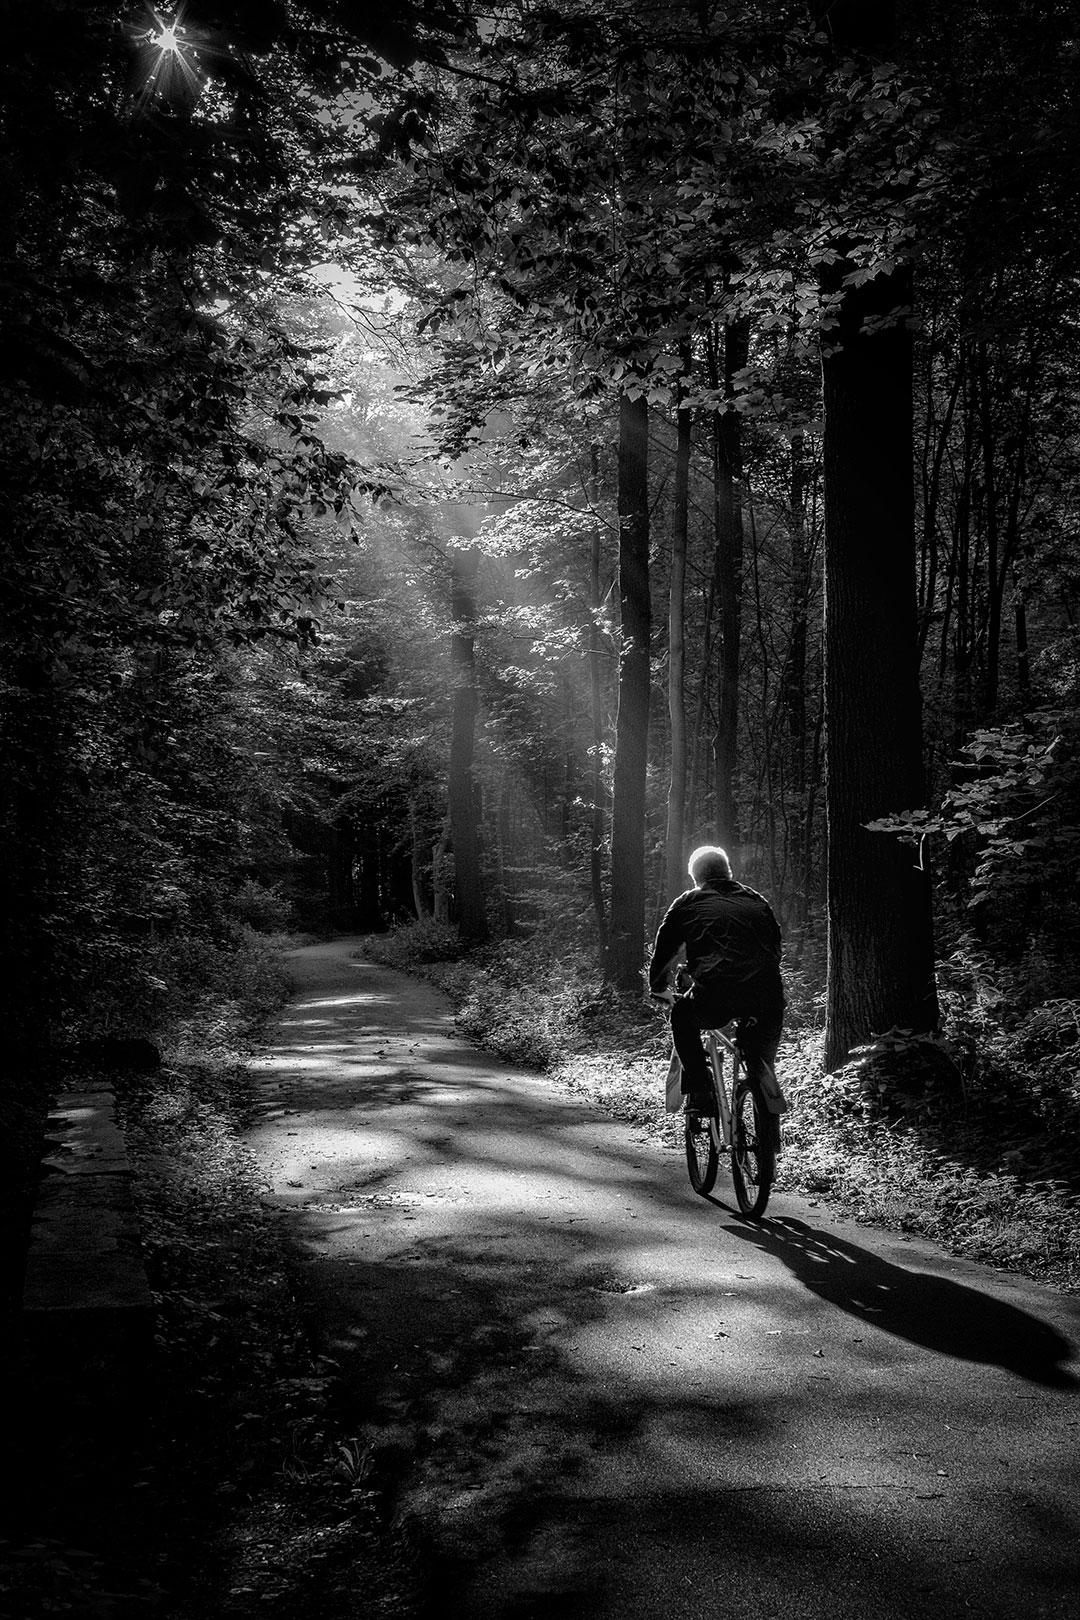 Ride into the light - mein erster NFT - Sebastian Berger